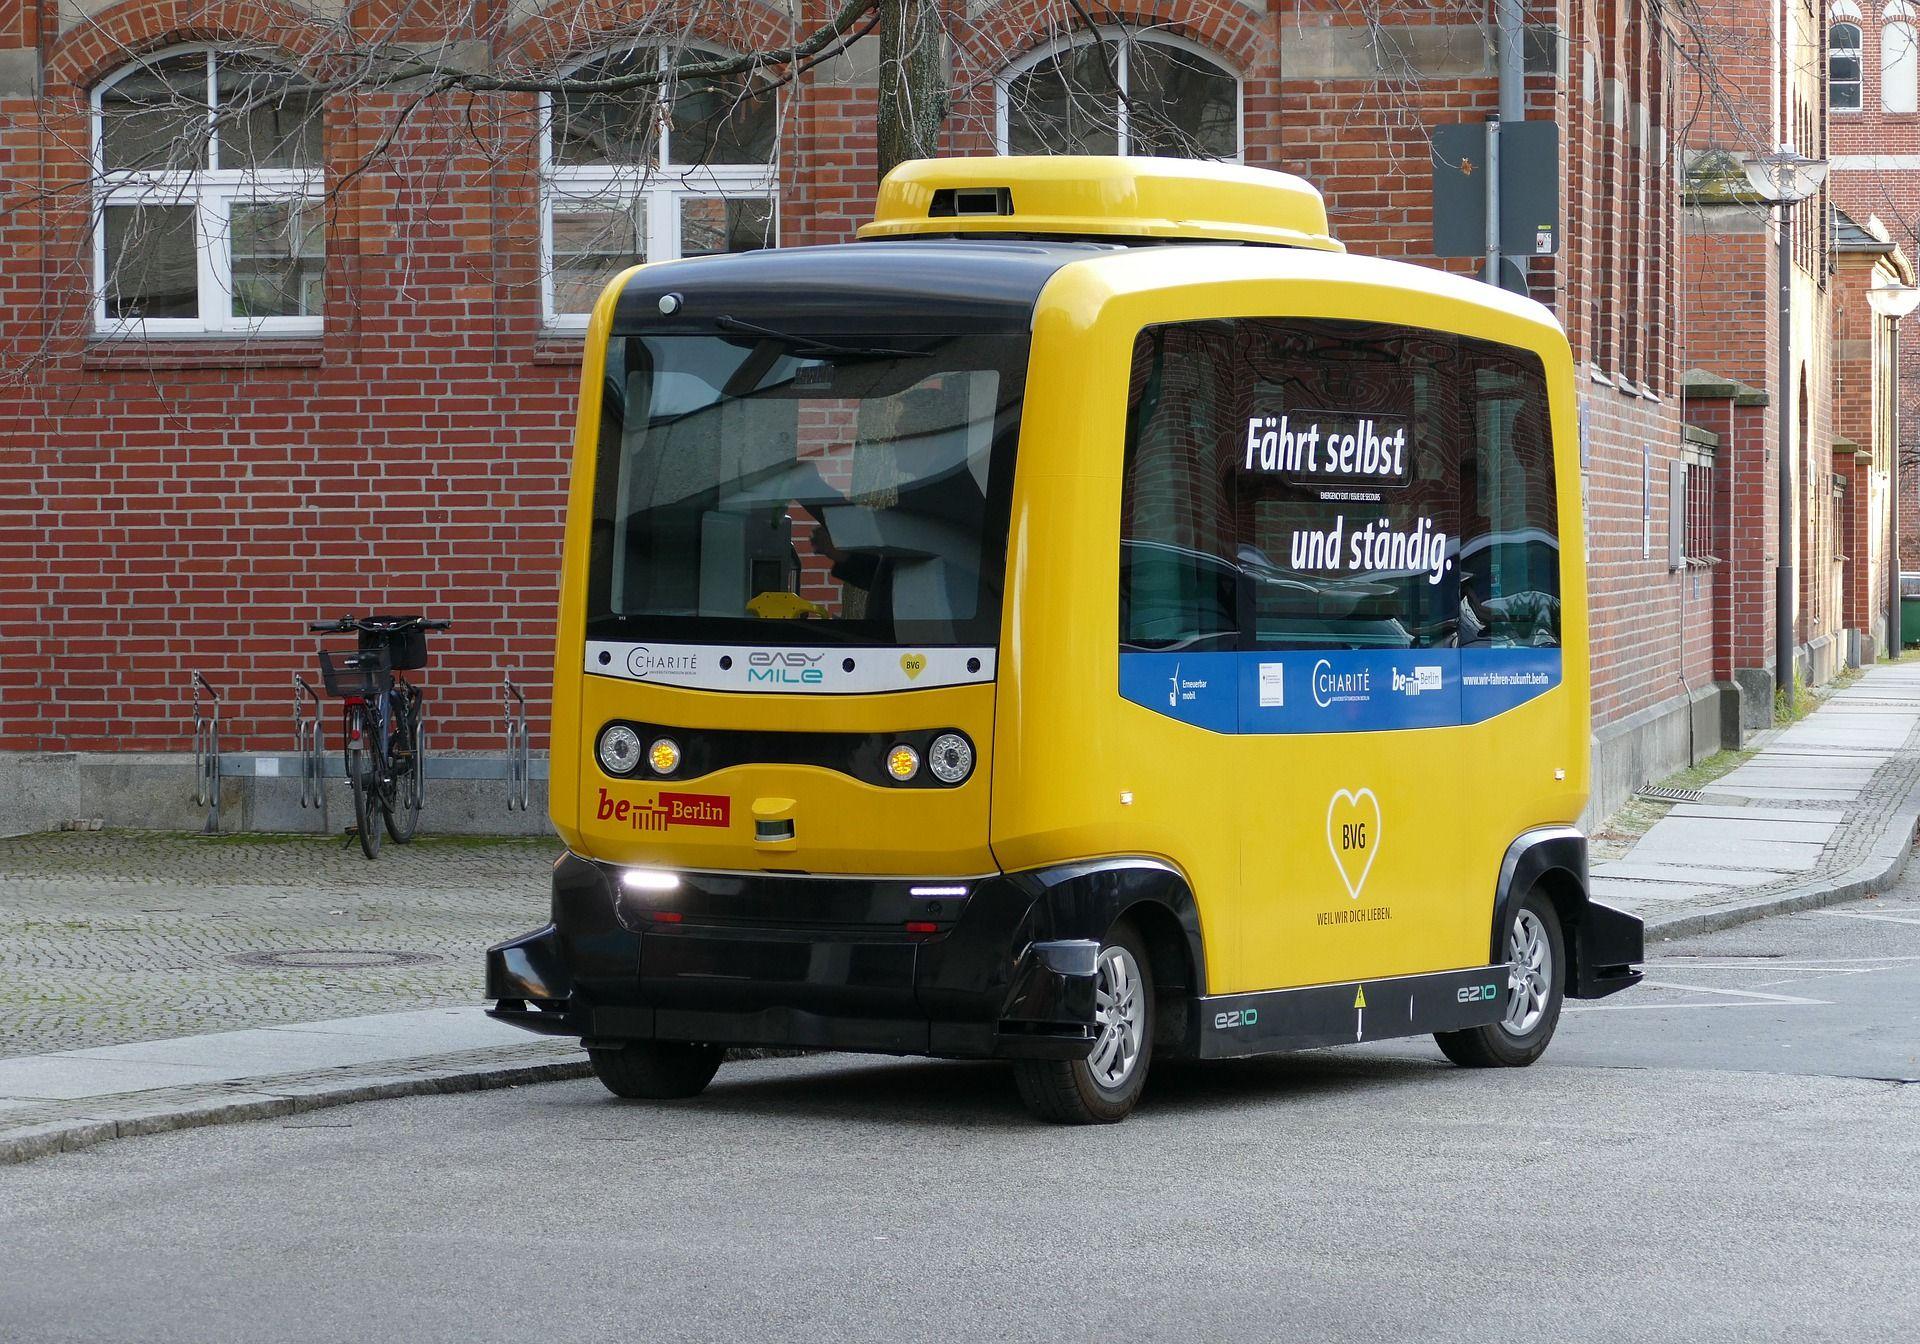 Autonome Autos sollen ab 2022 fahren dürfen